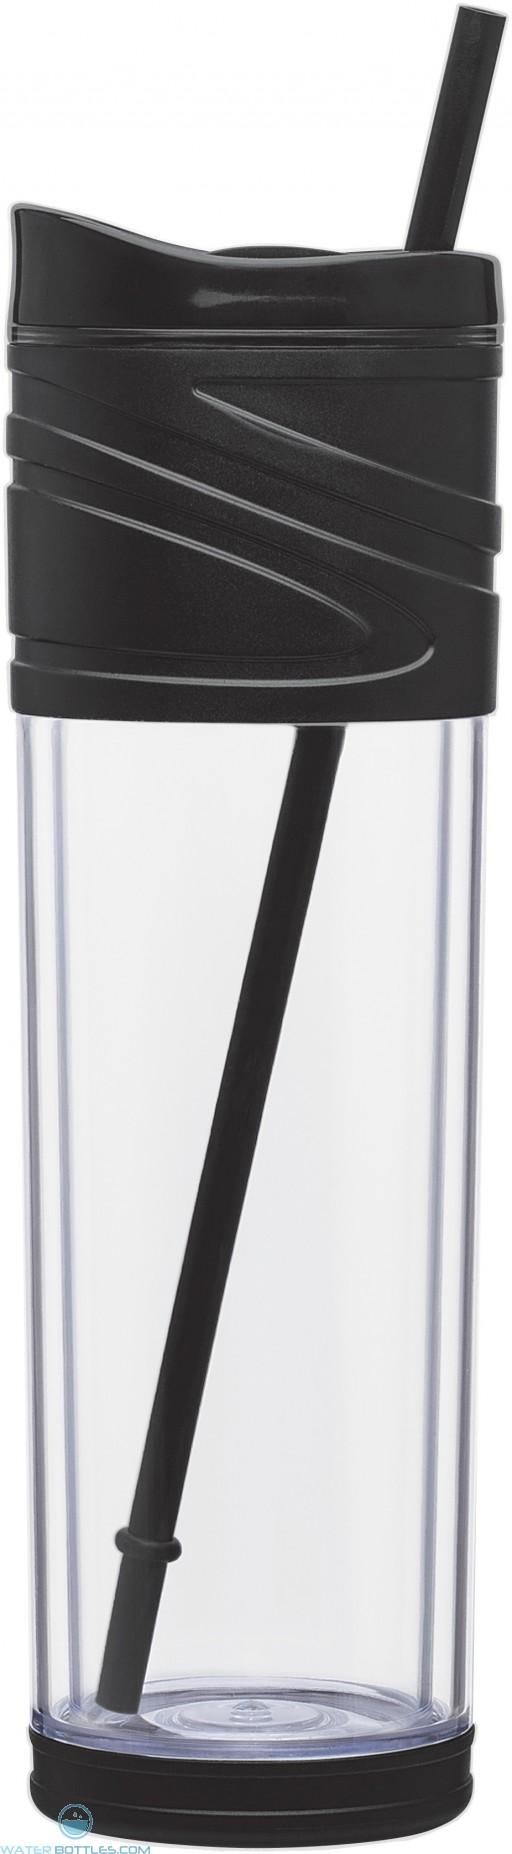 Melrose Water Bottles   16 oz - Black